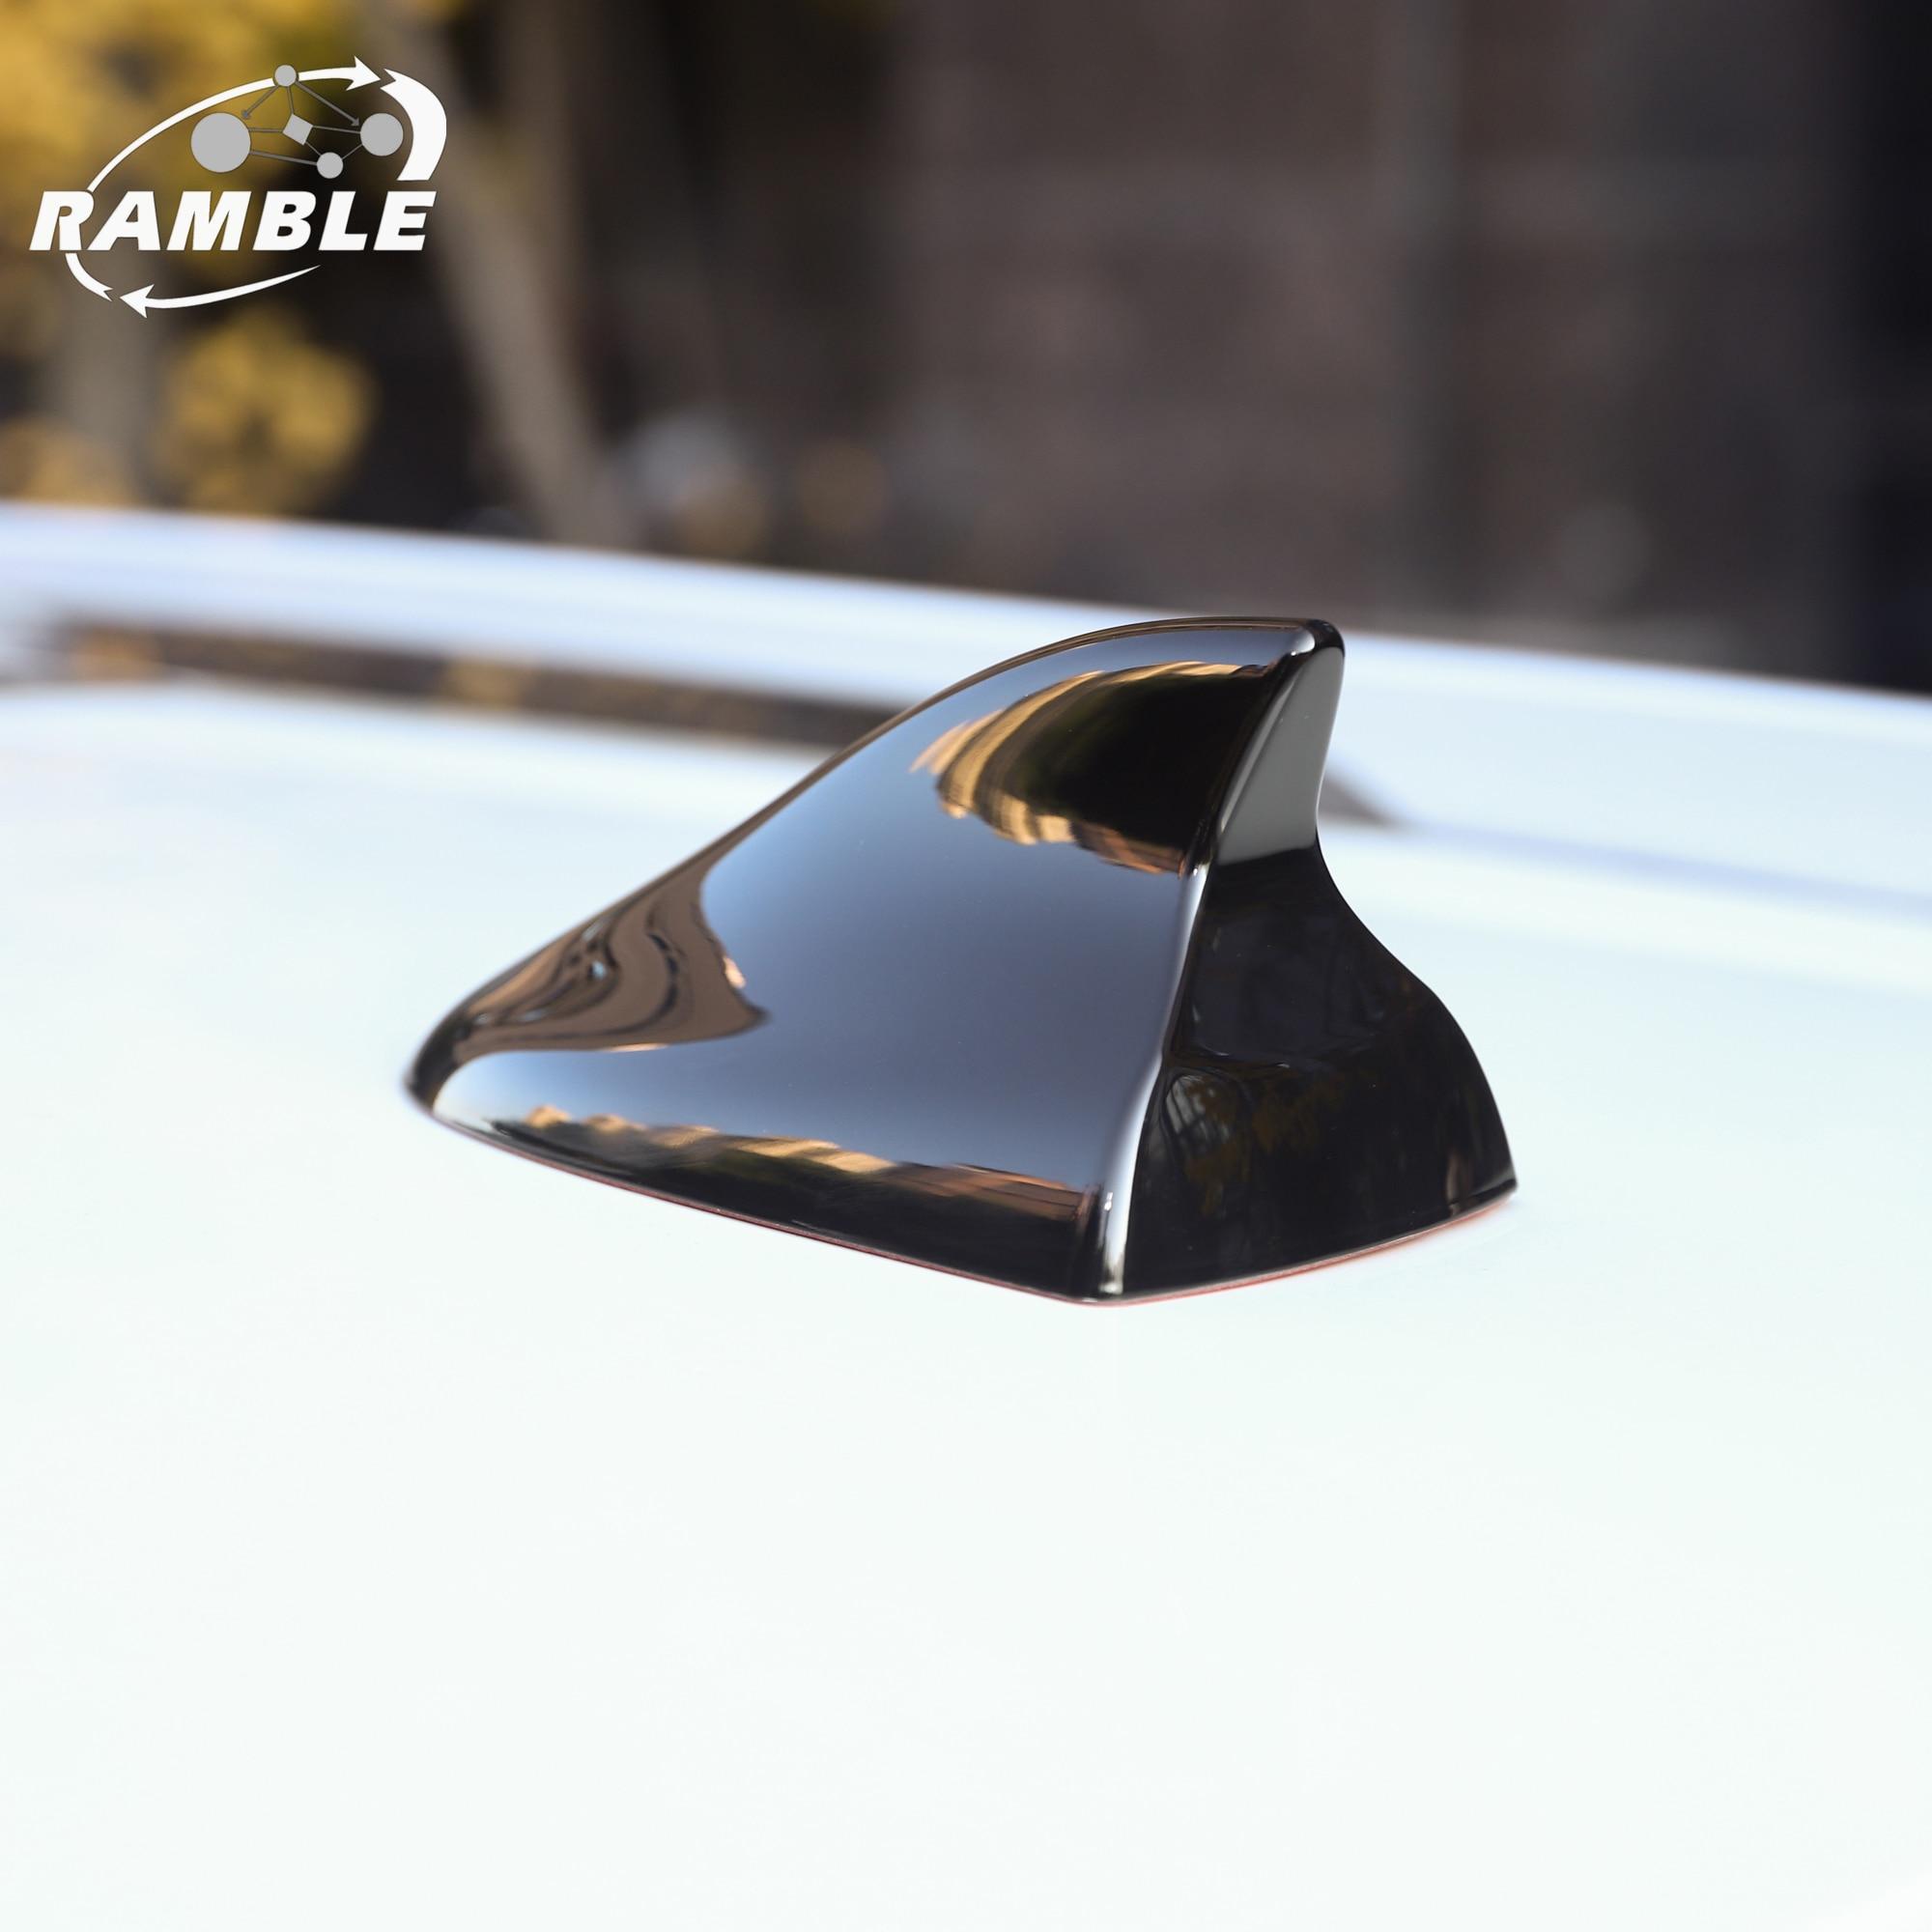 Ramble Antenna Shark Fin Car Roof Accessories Radio Aerial Vehicle Exterior for Chery Tiggo 5 3 X1 A